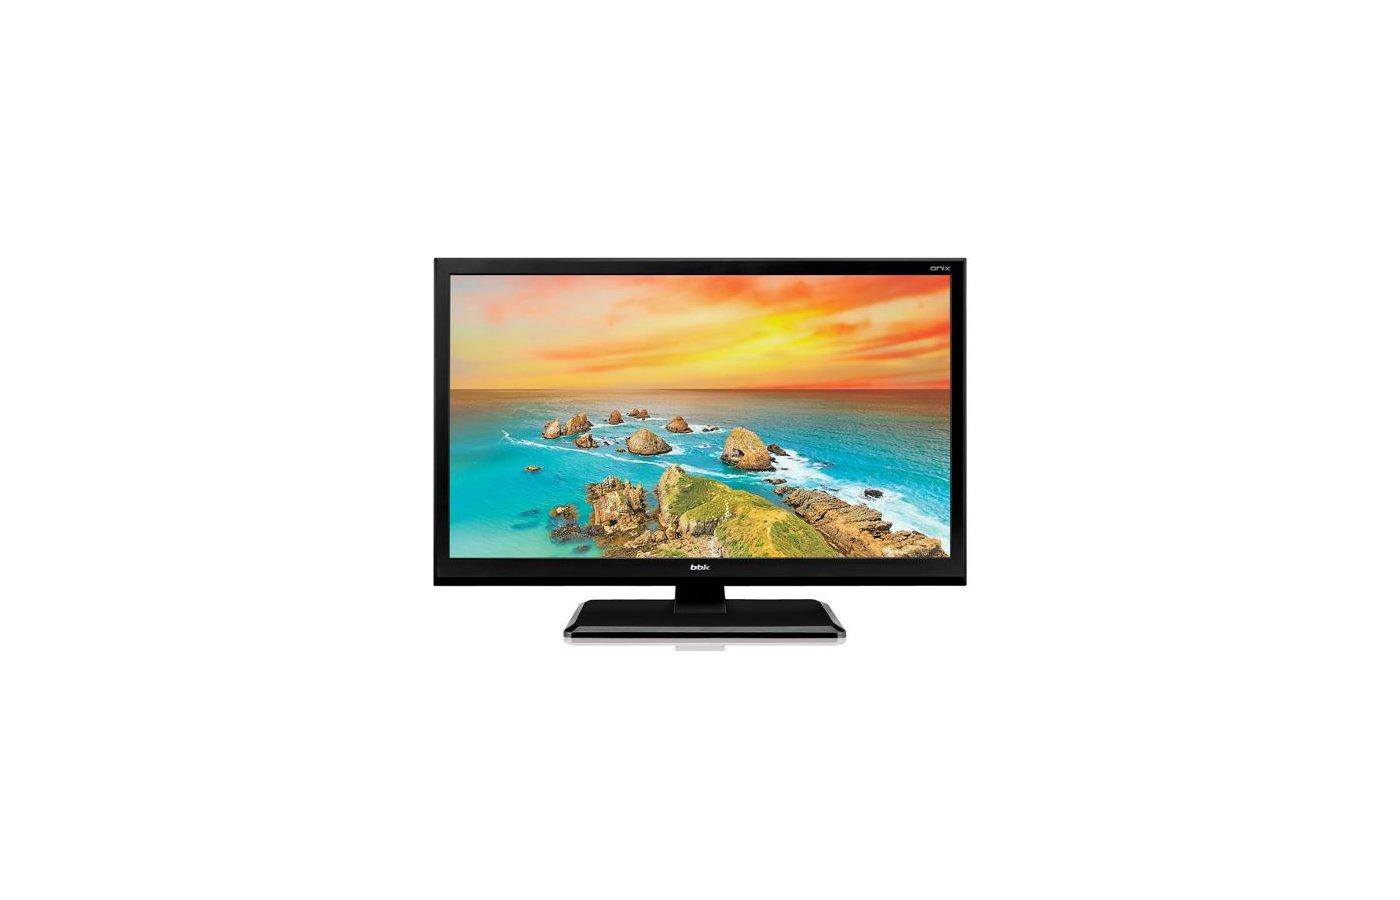 LED телевизор BBK 22LEM 1001/FT2C (2RC) black